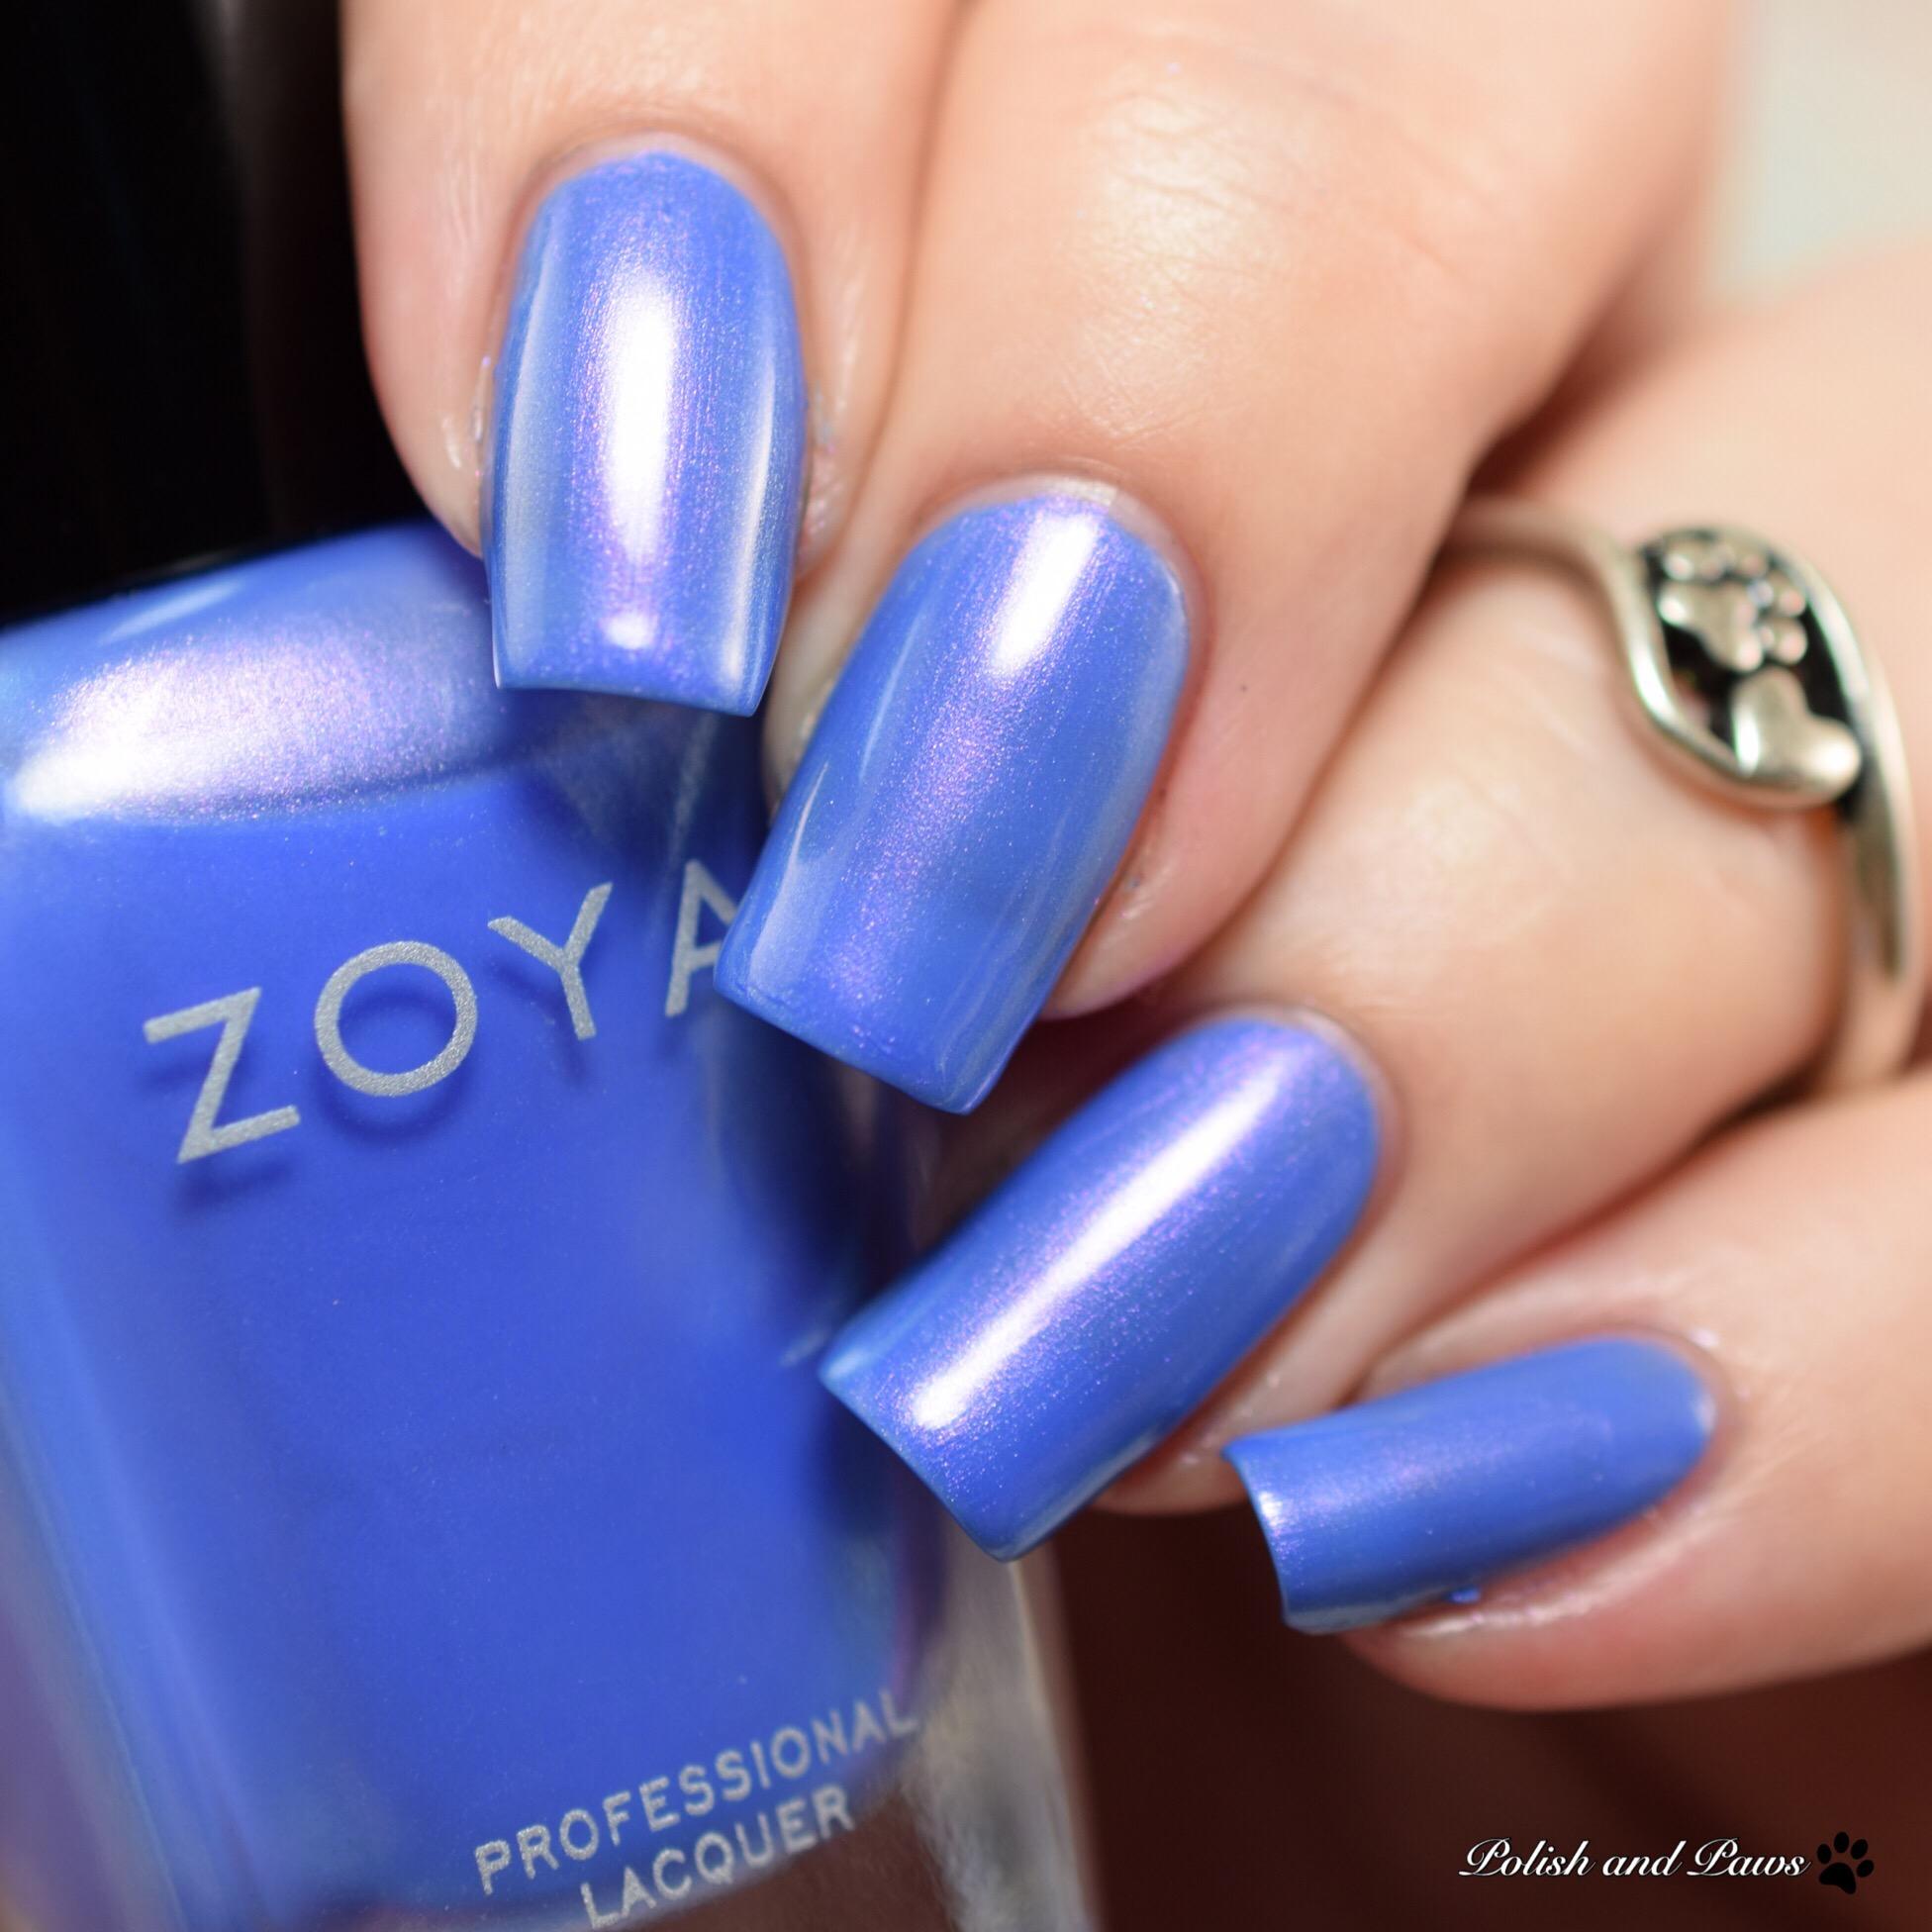 Zoya Saint